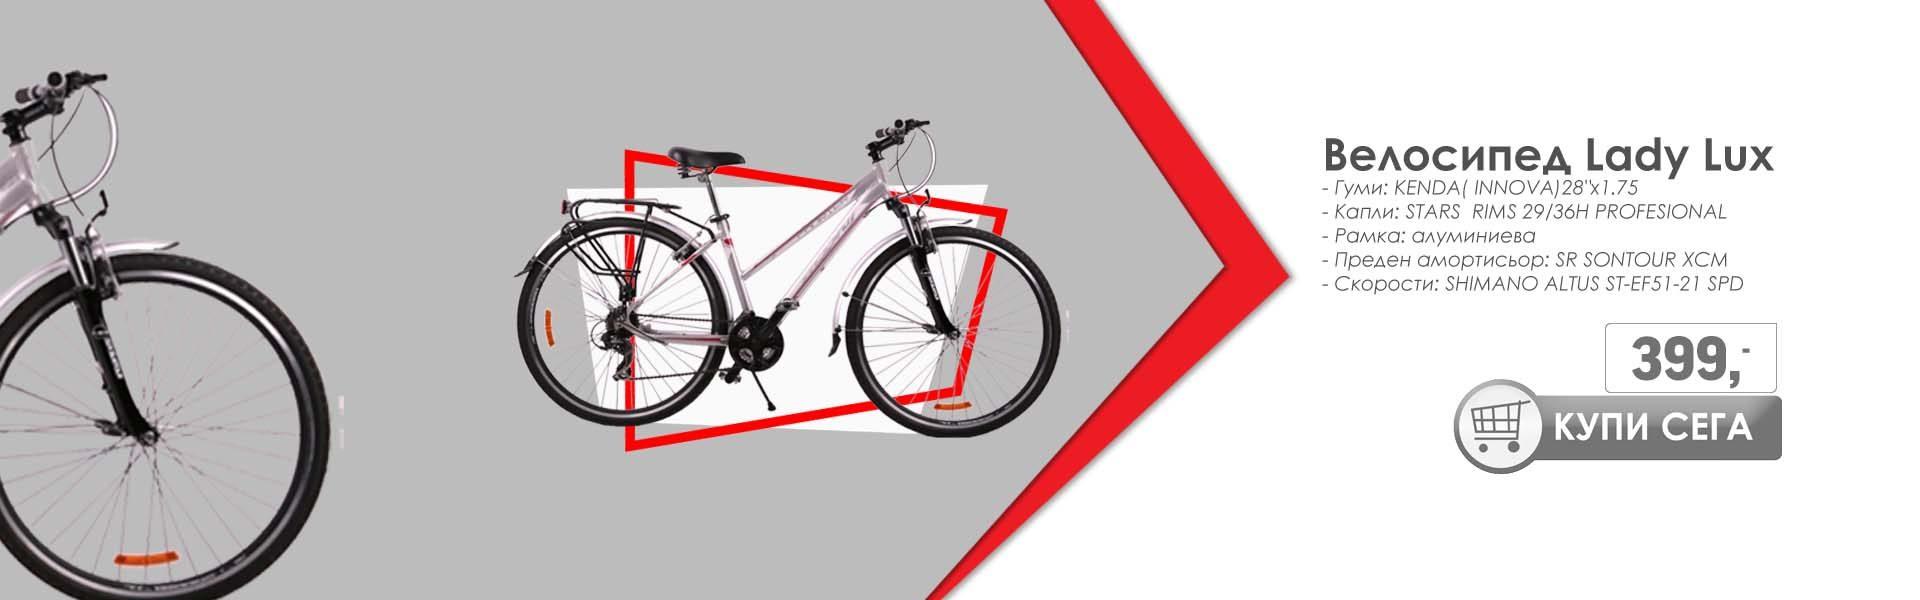 Велосипед Lady Lux